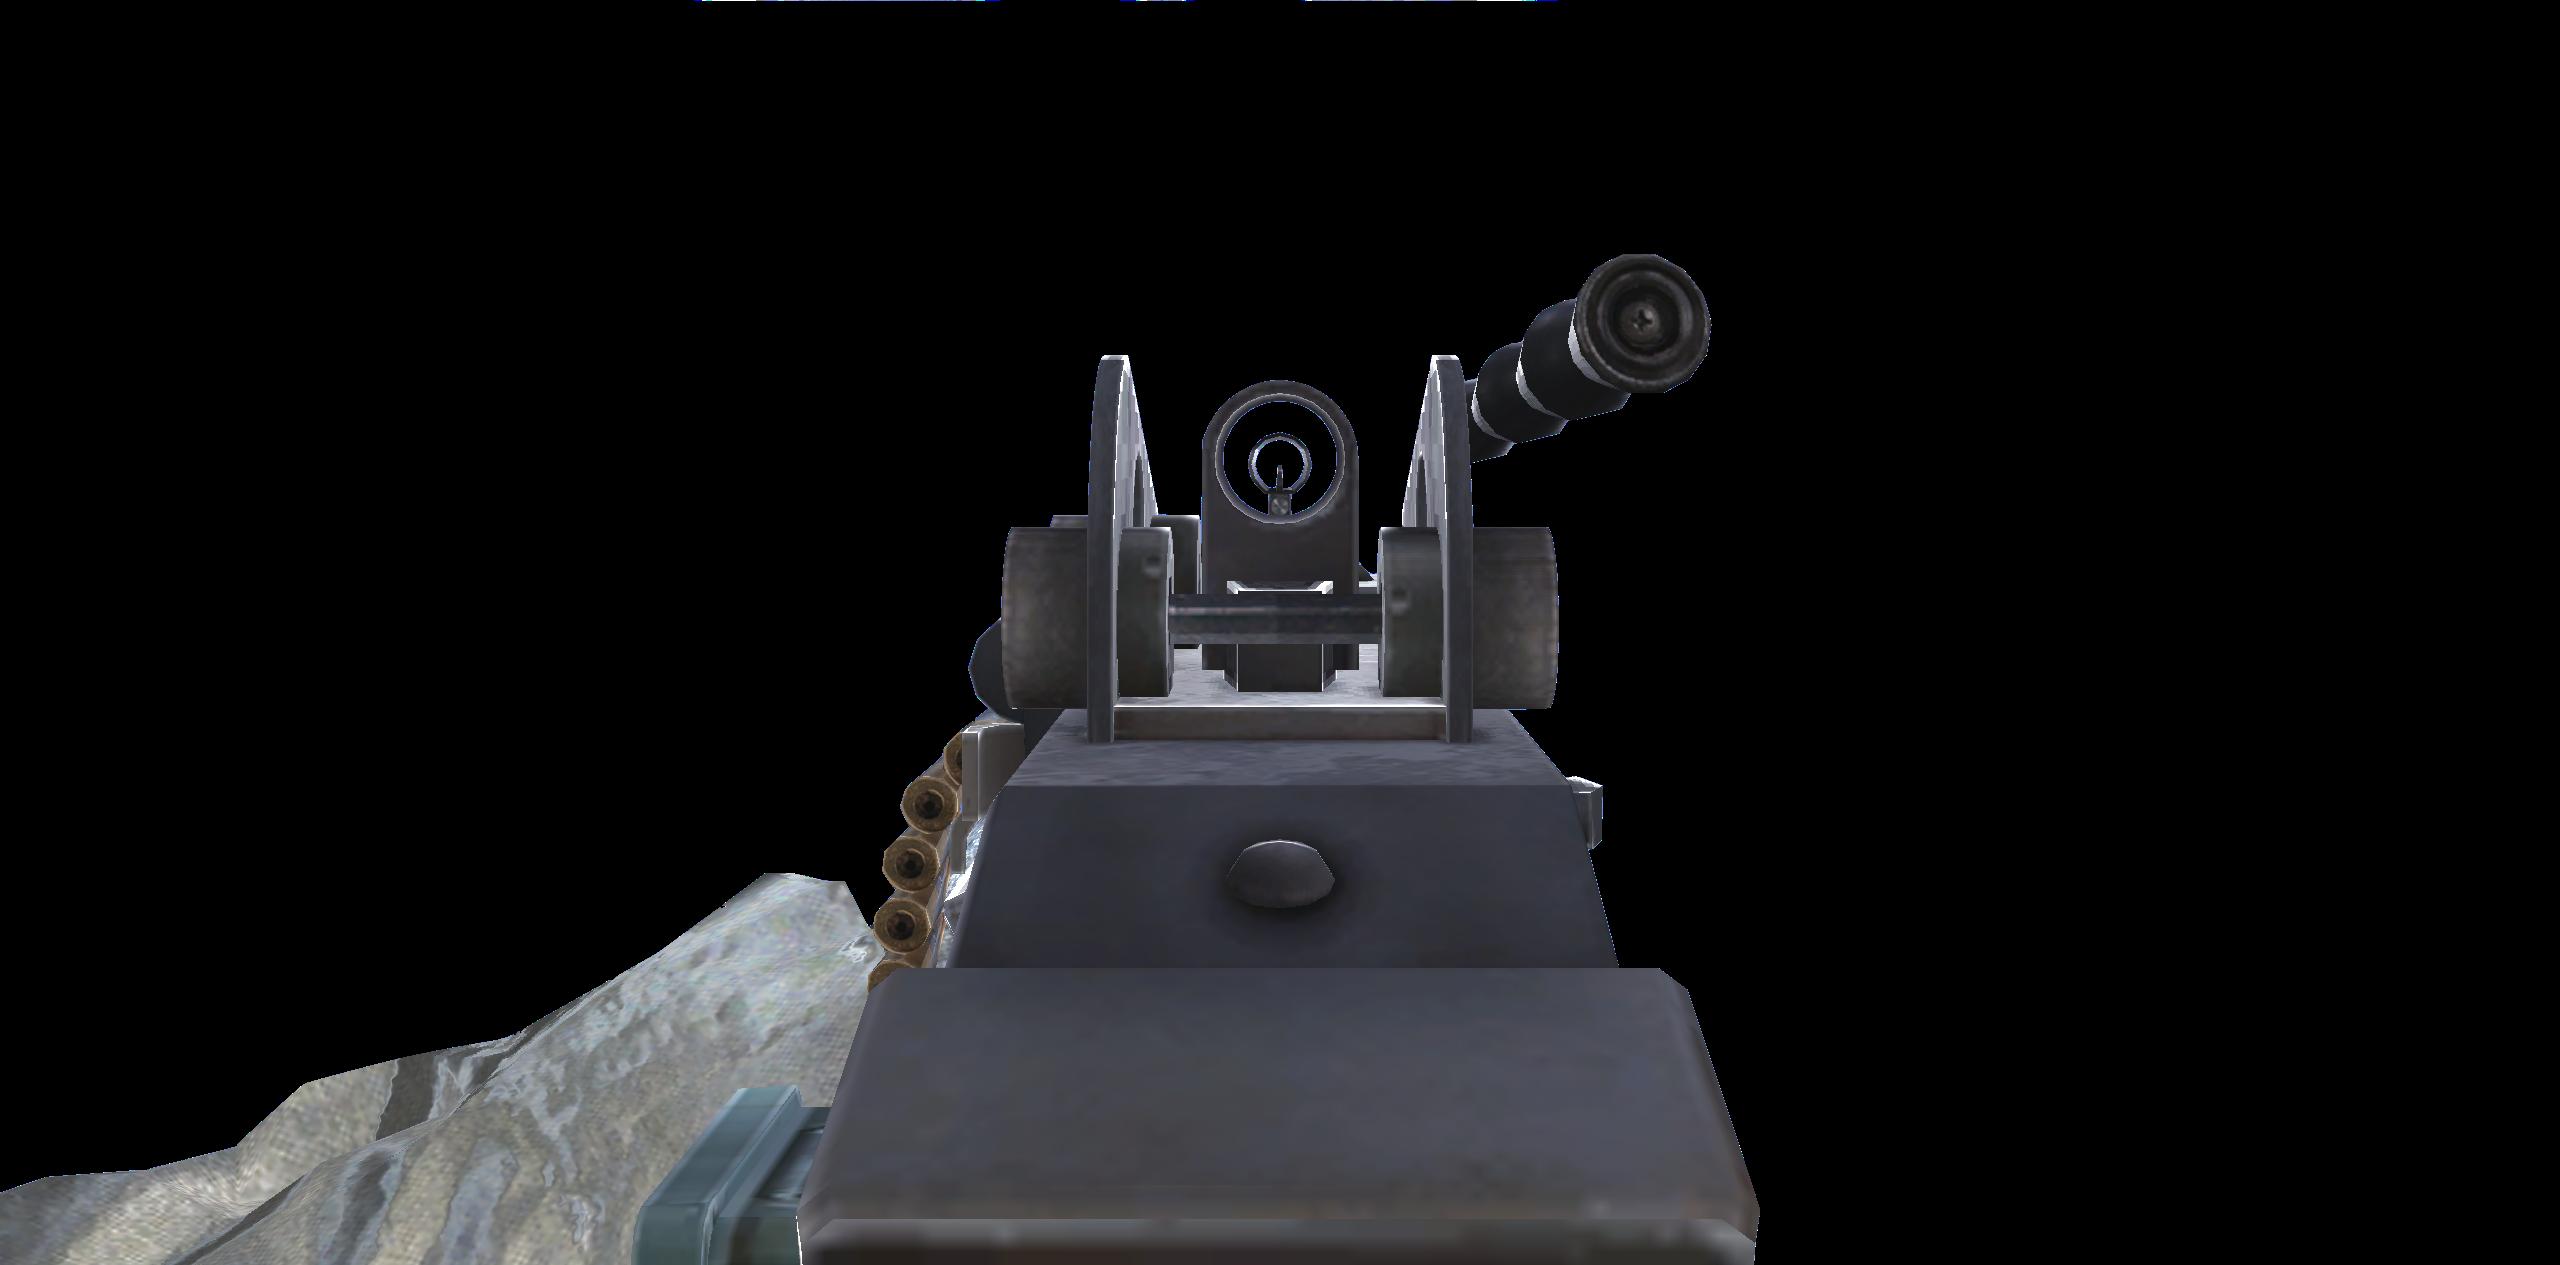 File:M249 SAW Iron Sights CoD4.png